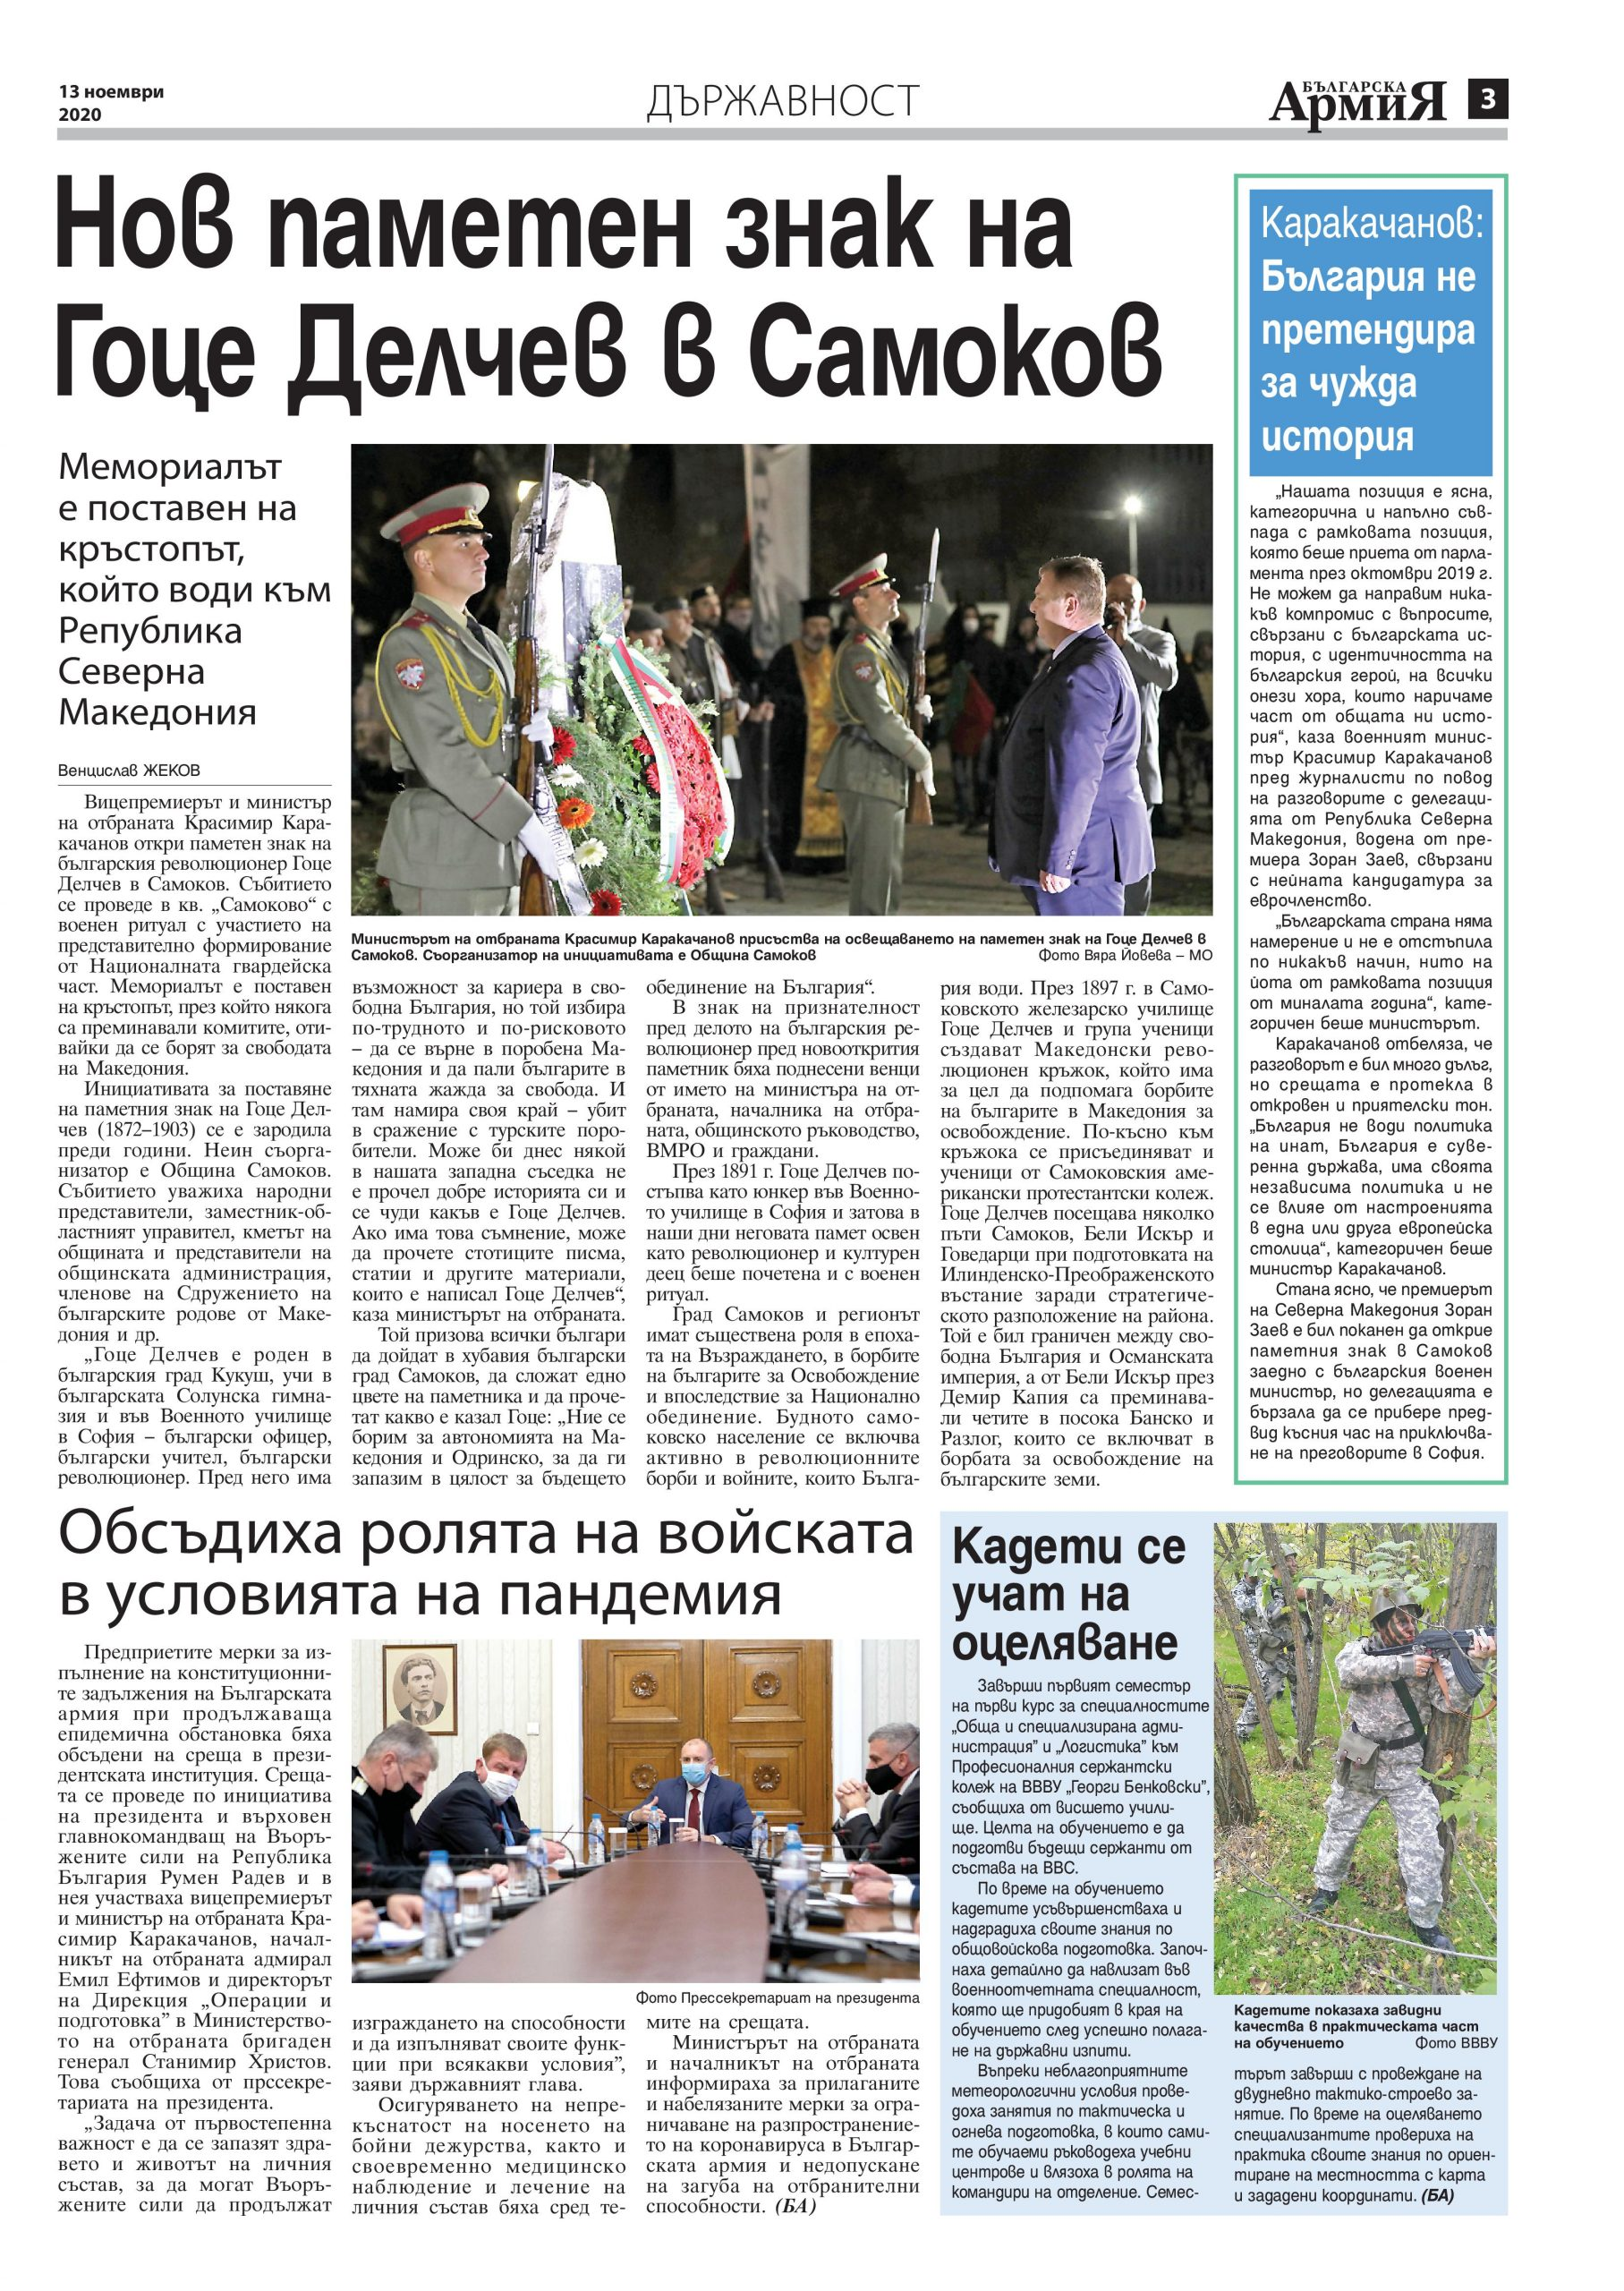 https://armymedia.bg/wp-content/uploads/2015/06/03-47-scaled.jpg